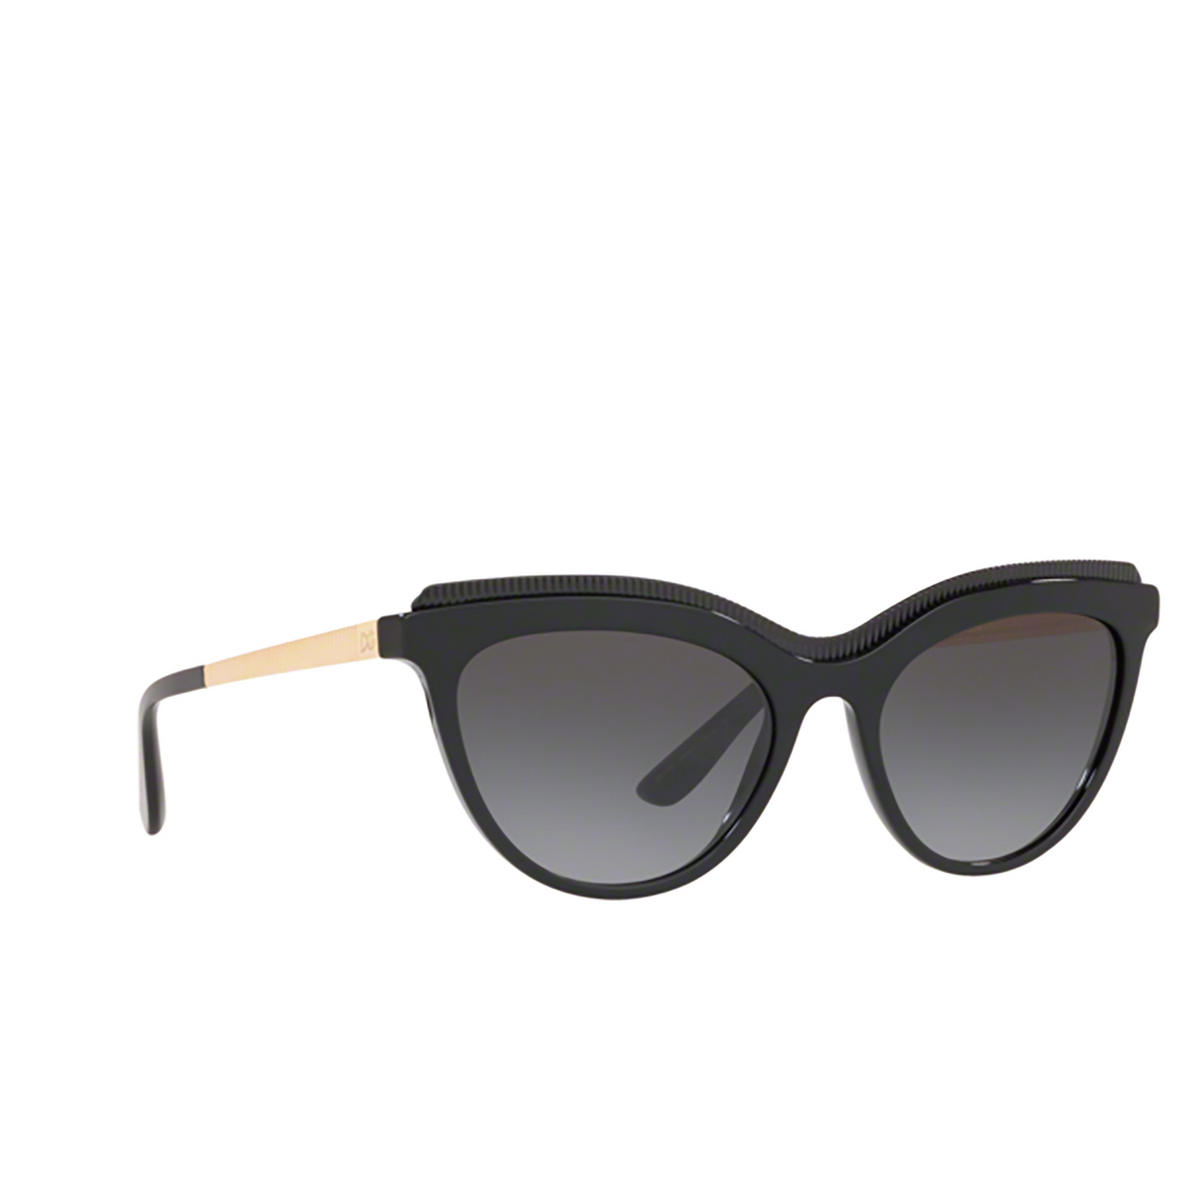 Dolce & Gabbana® Cat-eye Sunglasses: DG4335 color Black 501/8G - 2/3.